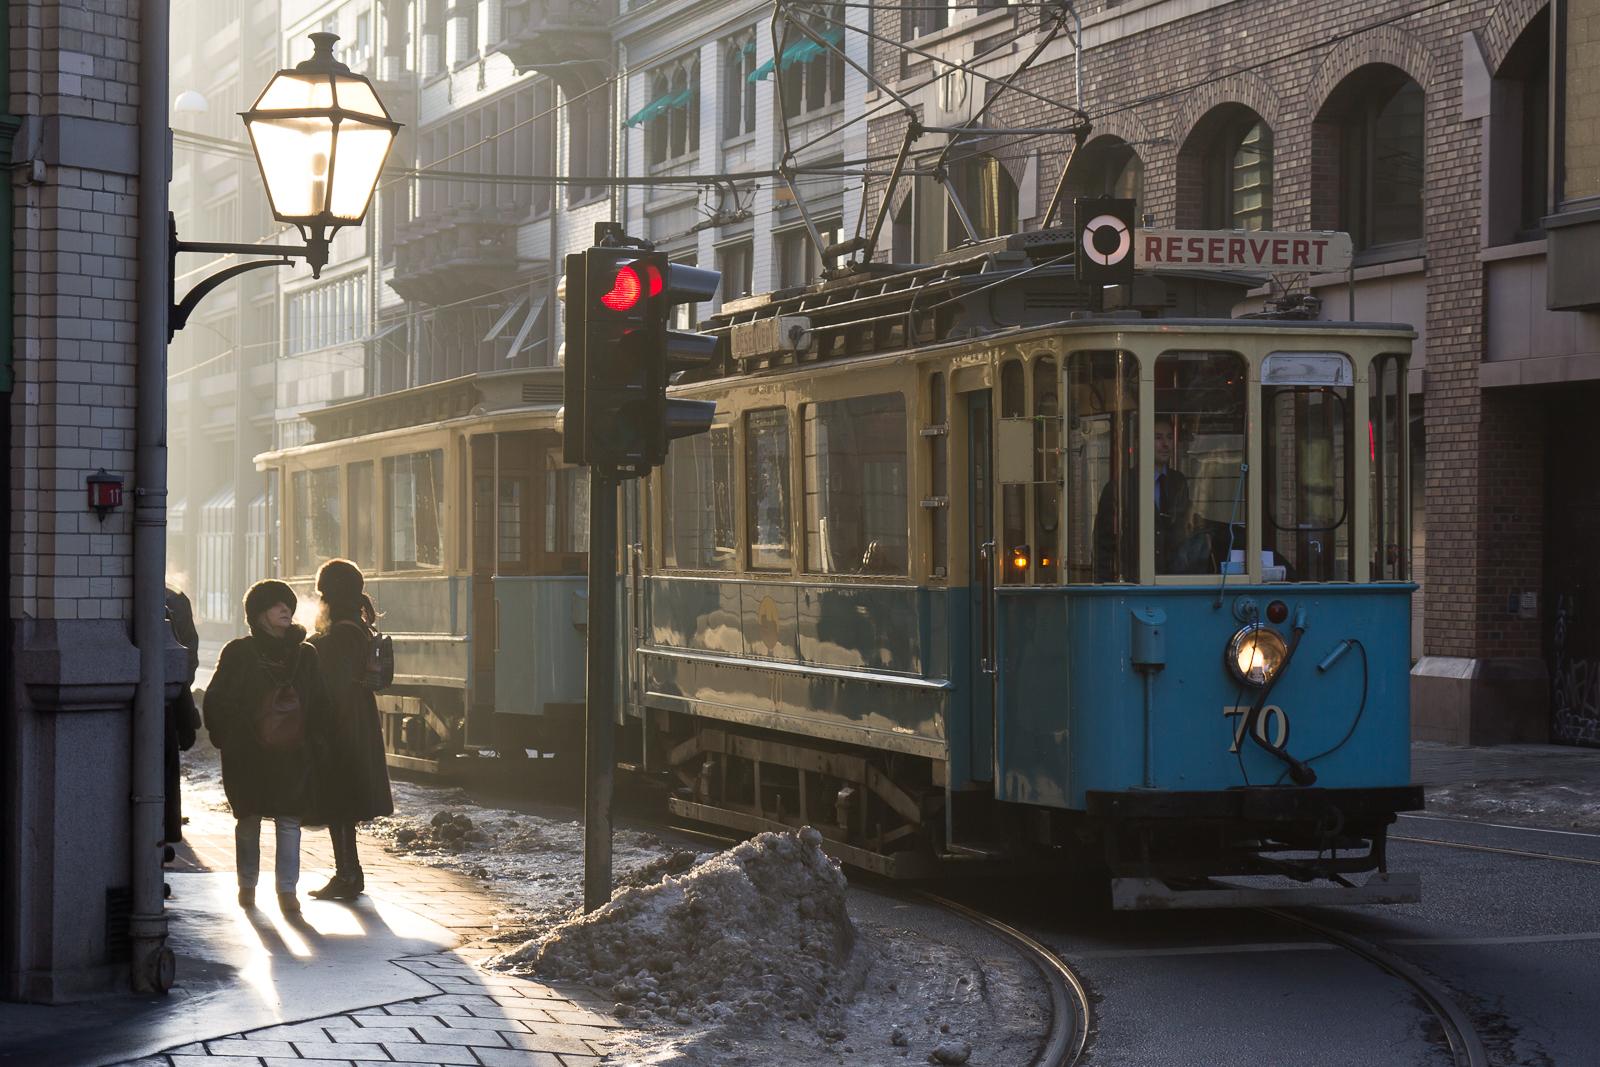 Vintage tram in central Oslo